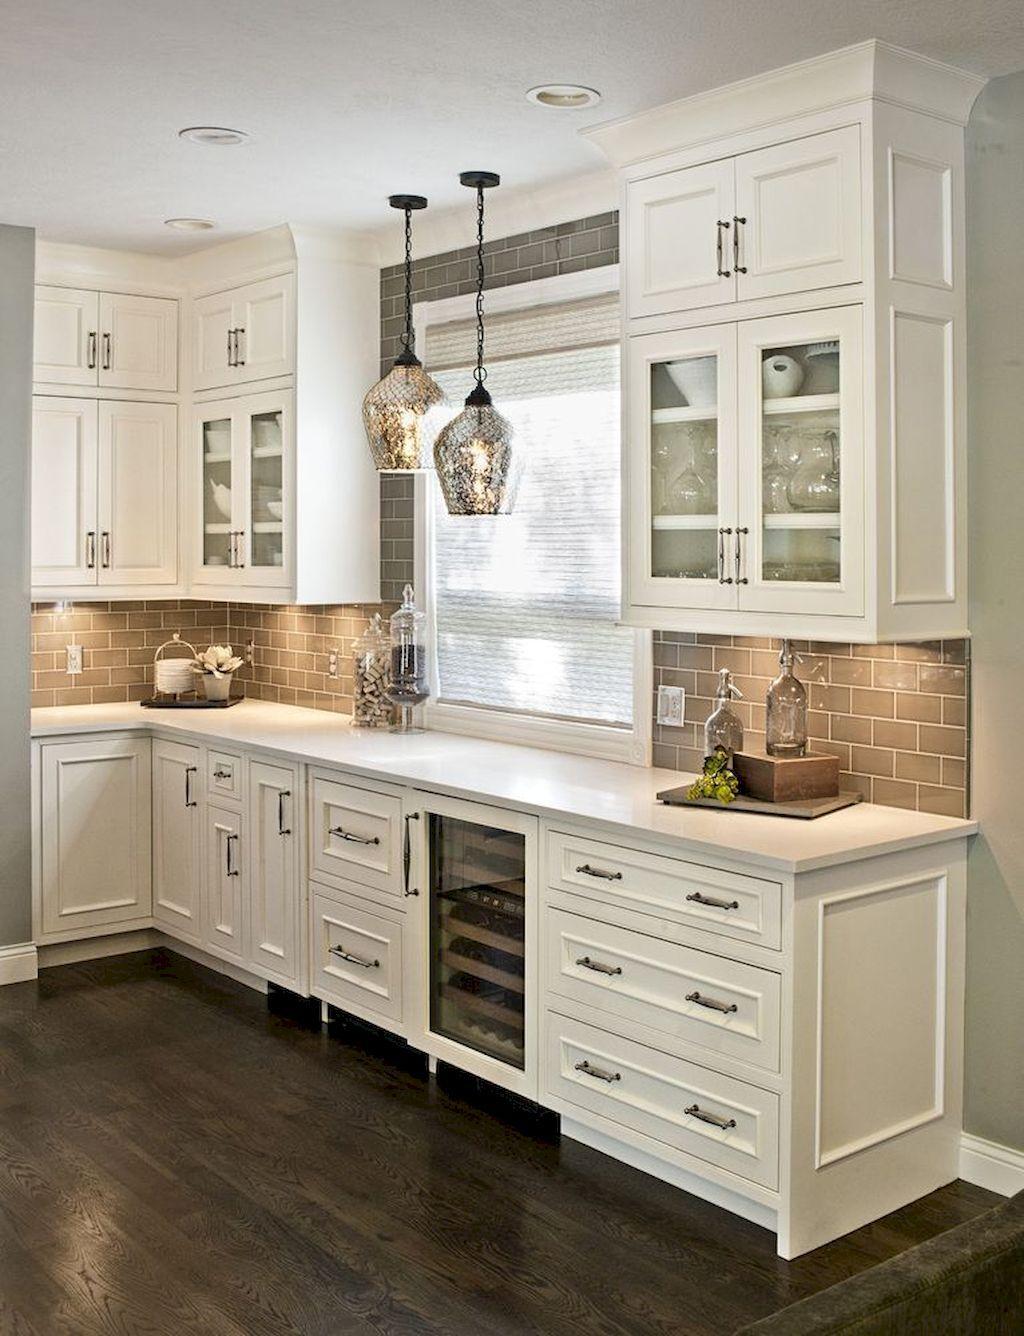 Incredible rustic farmhouse gray kitchen cabinets ideas